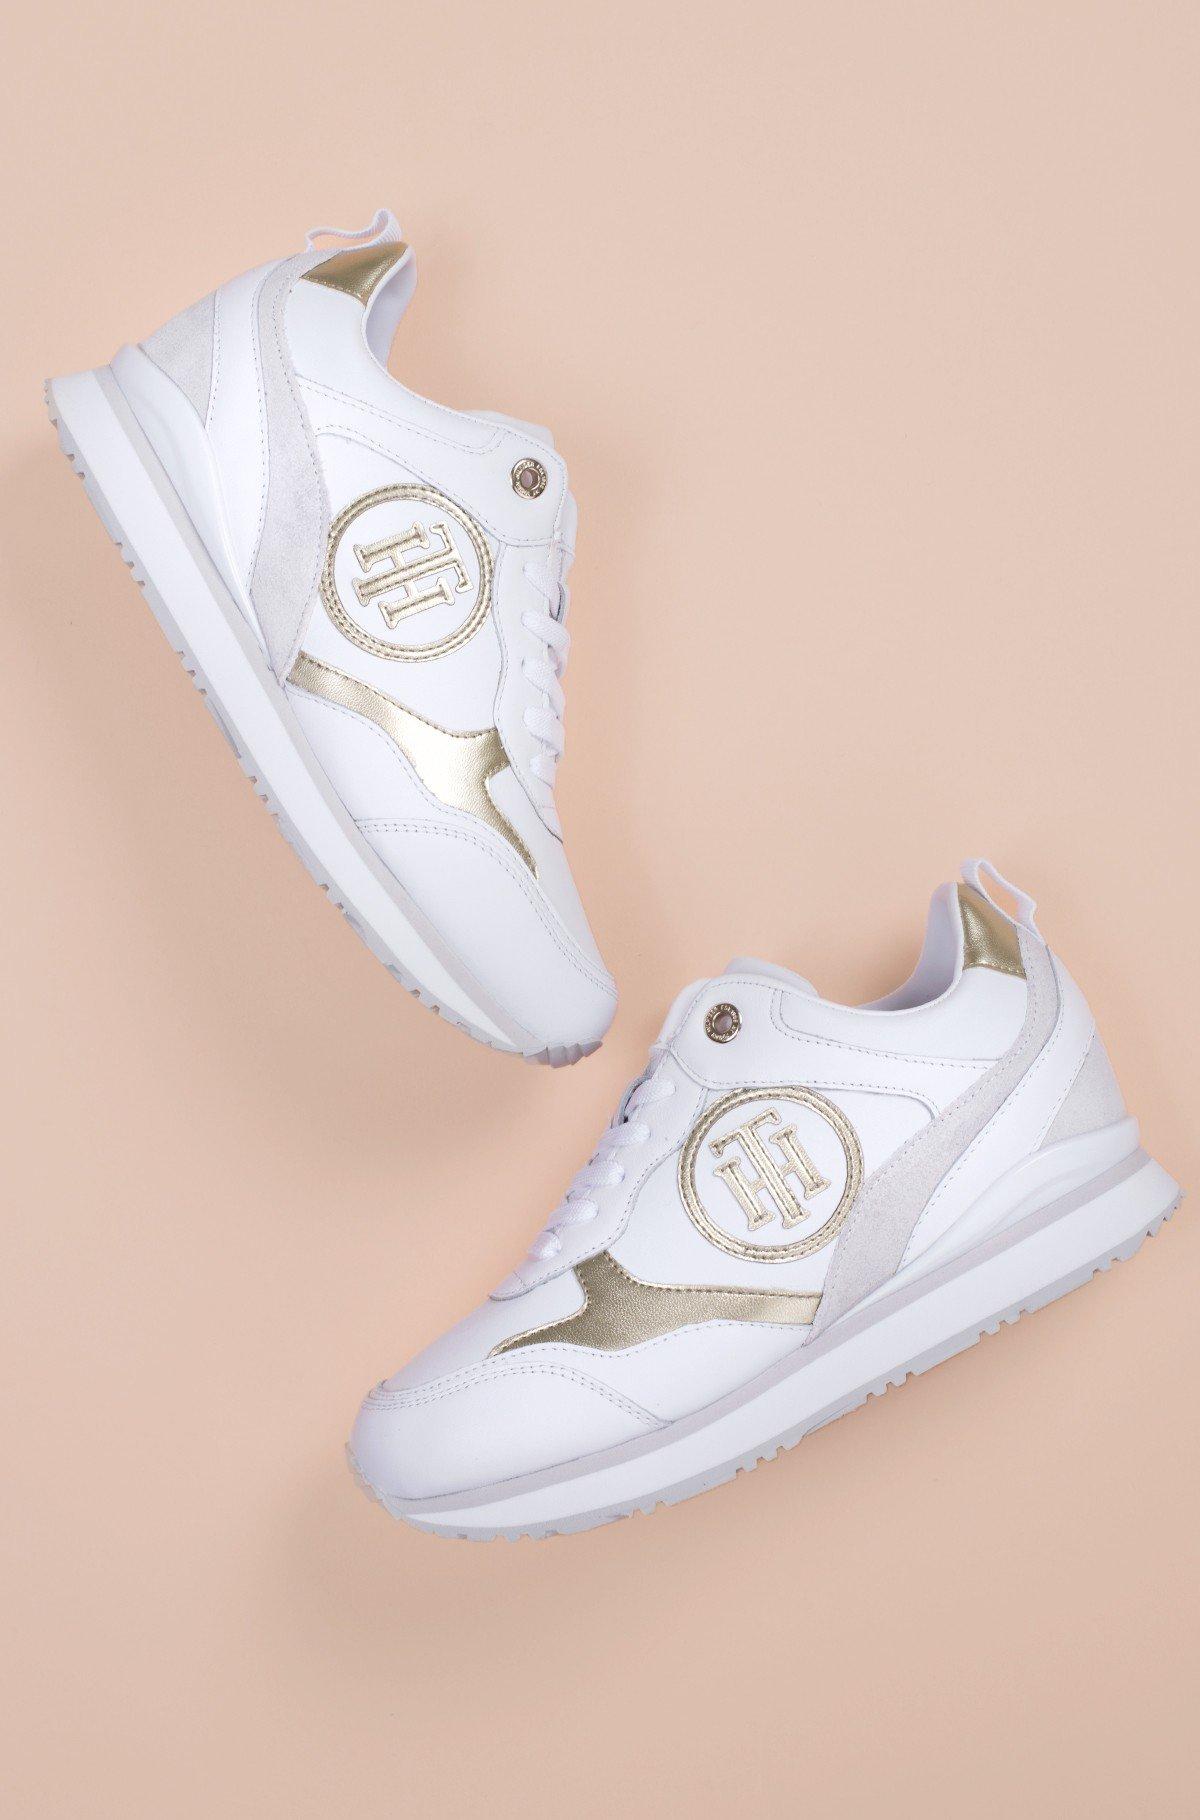 Casual shoes METALLIC DRESSY WEDGE SNEAKER-full-1